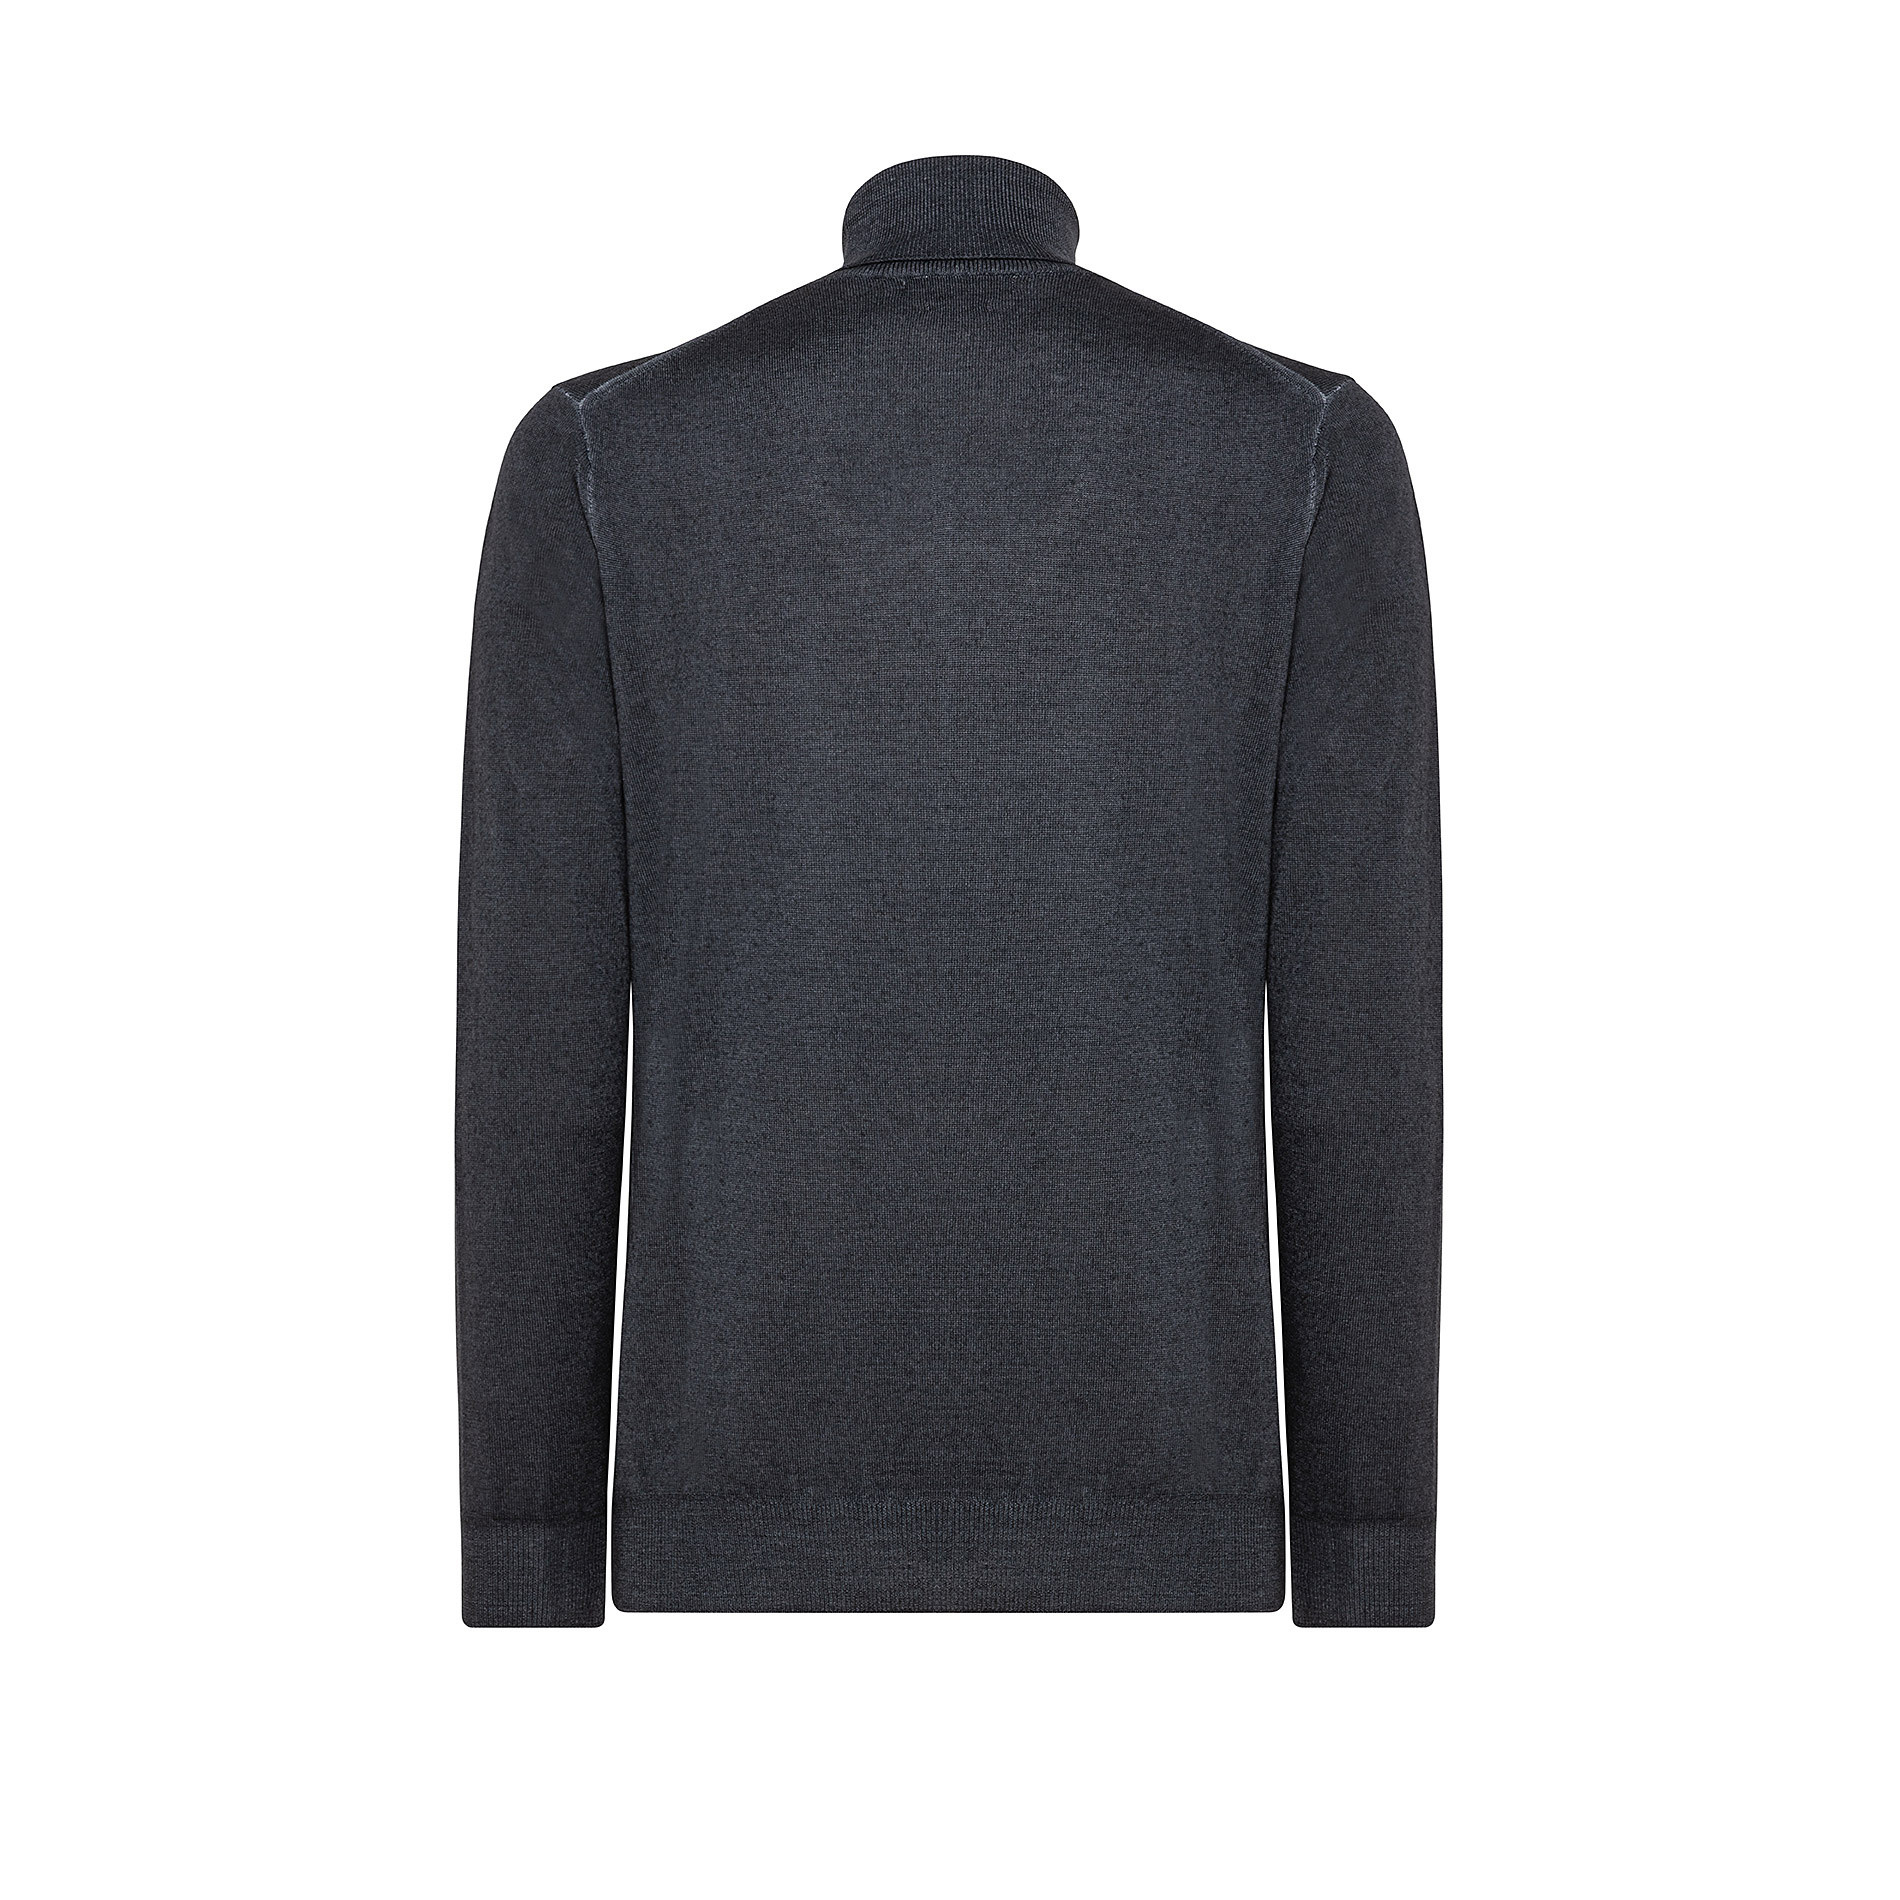 Pullover lana merinos collo alto, Grigio, large image number 1